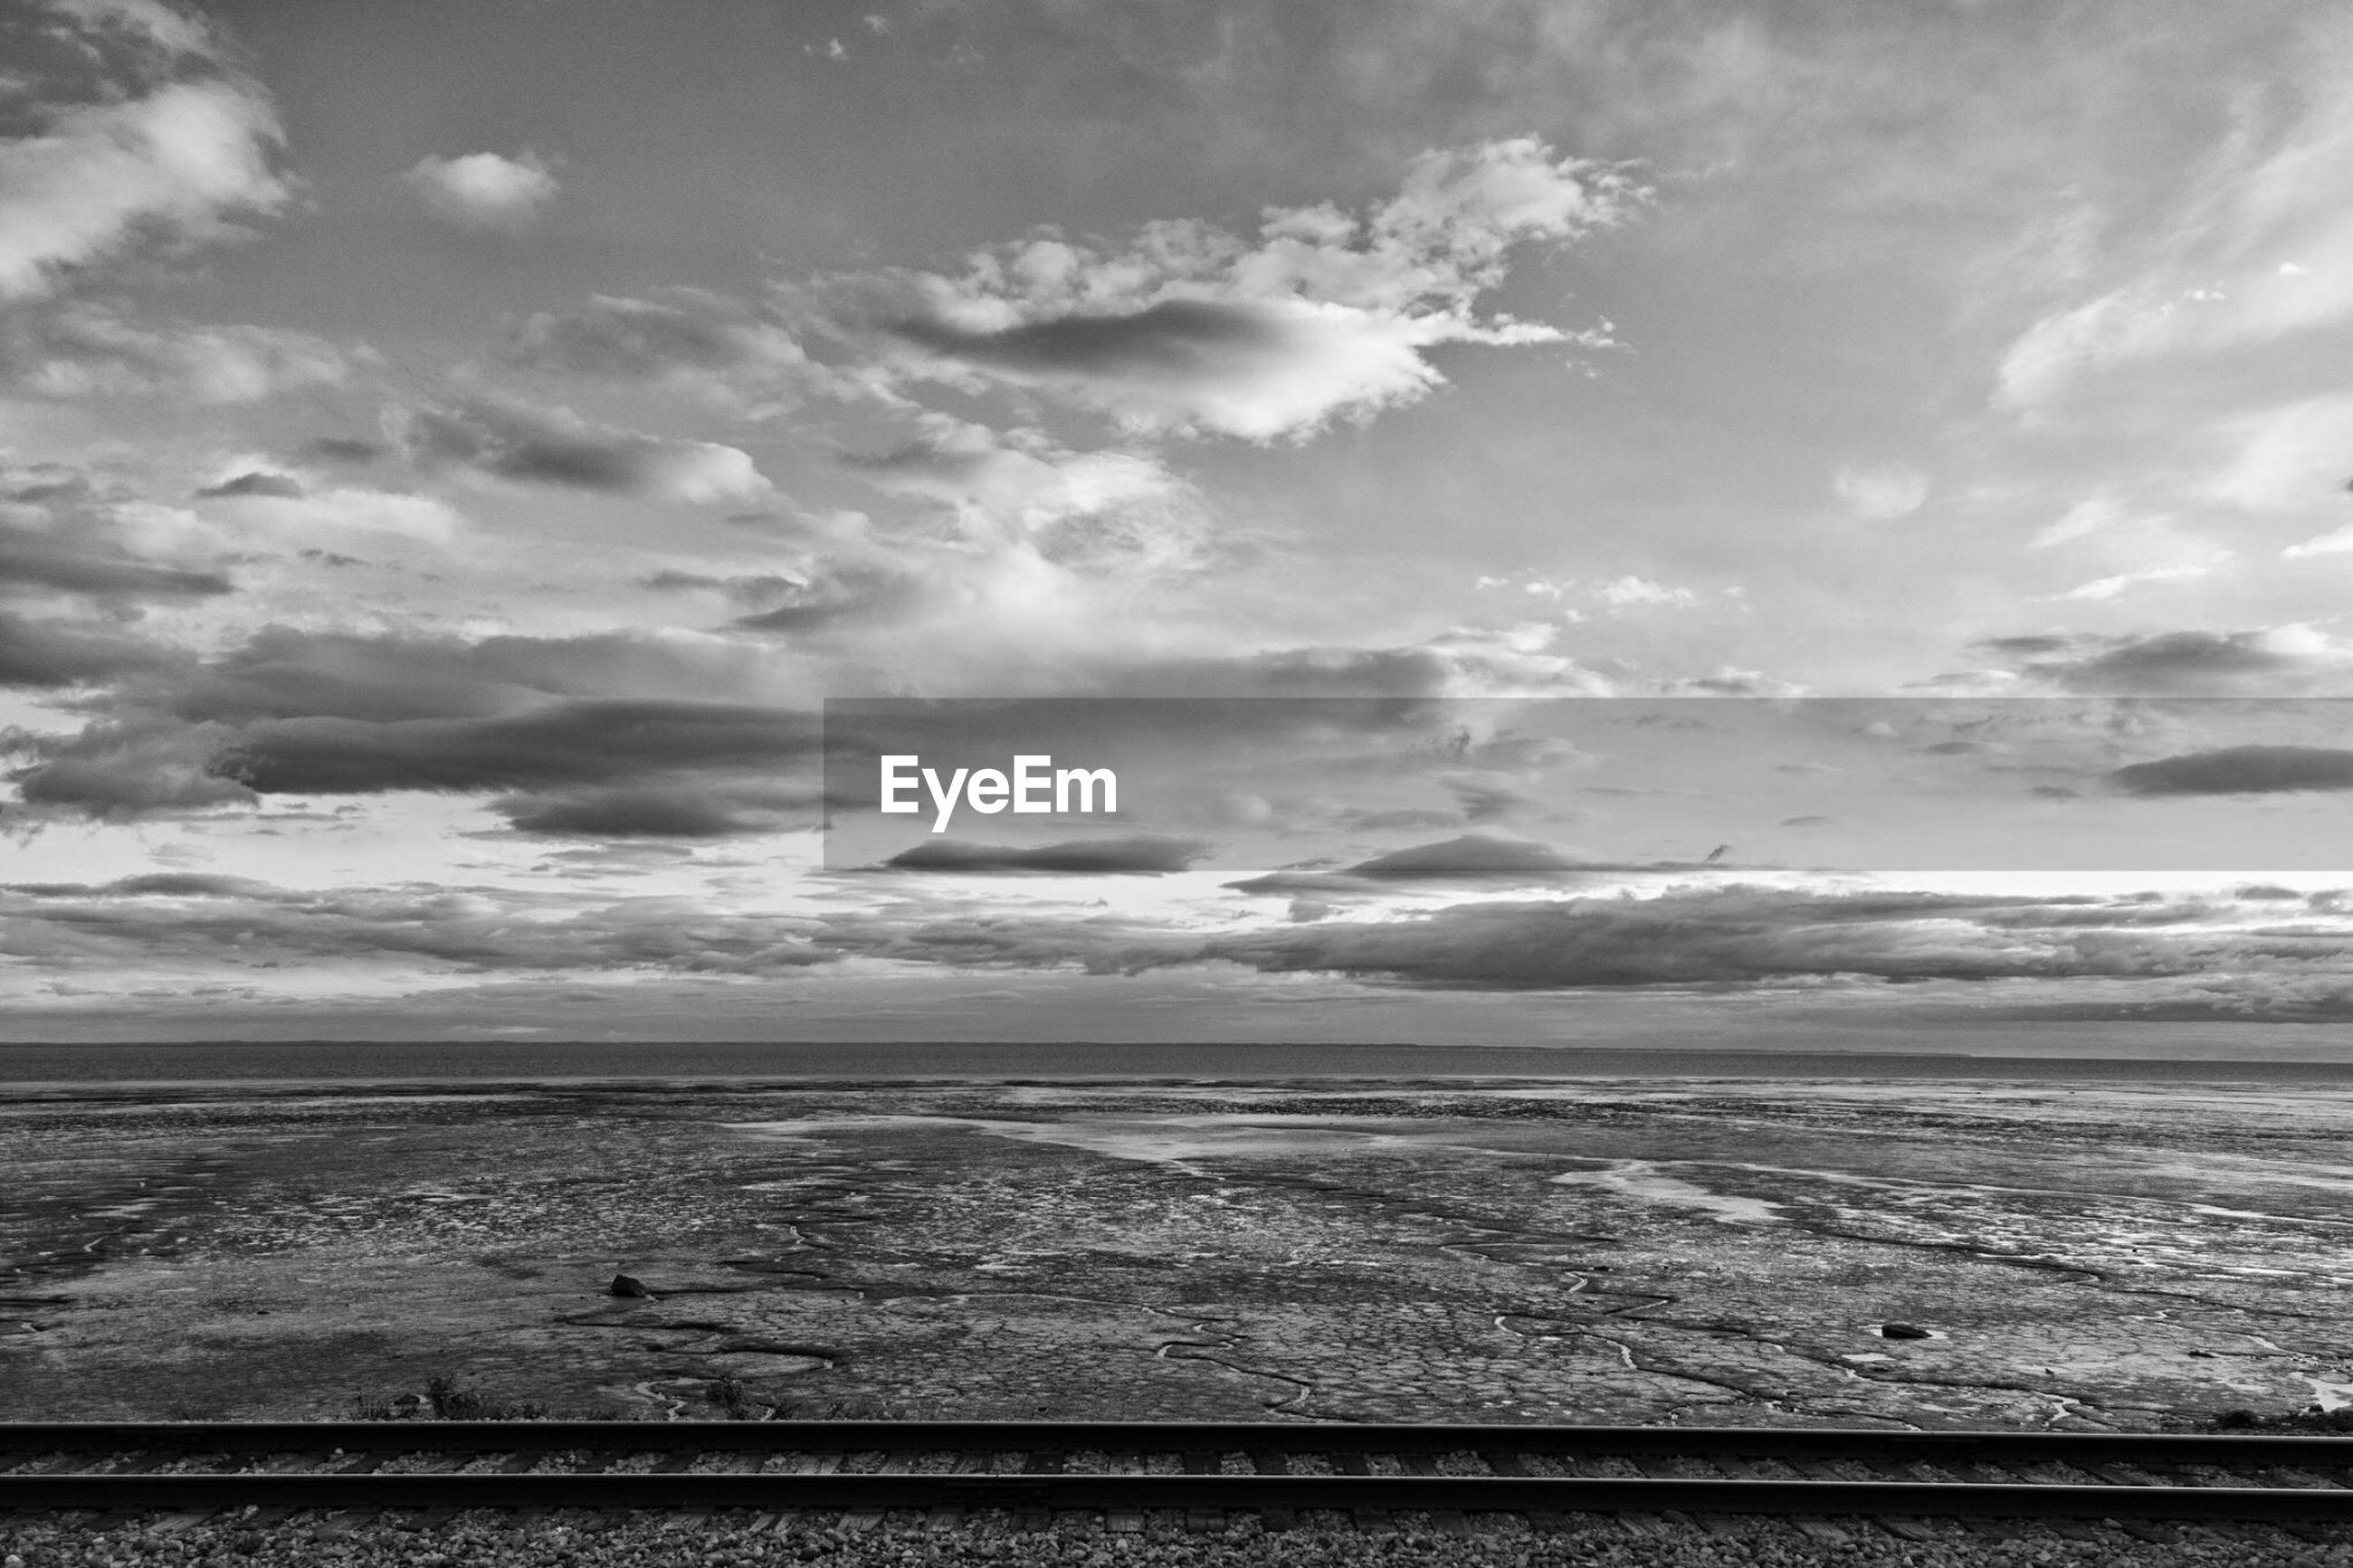 sea, horizon over water, water, sky, tranquil scene, beach, scenics, tranquility, beauty in nature, cloud - sky, shore, nature, cloud, cloudy, idyllic, seascape, sand, wave, coastline, calm